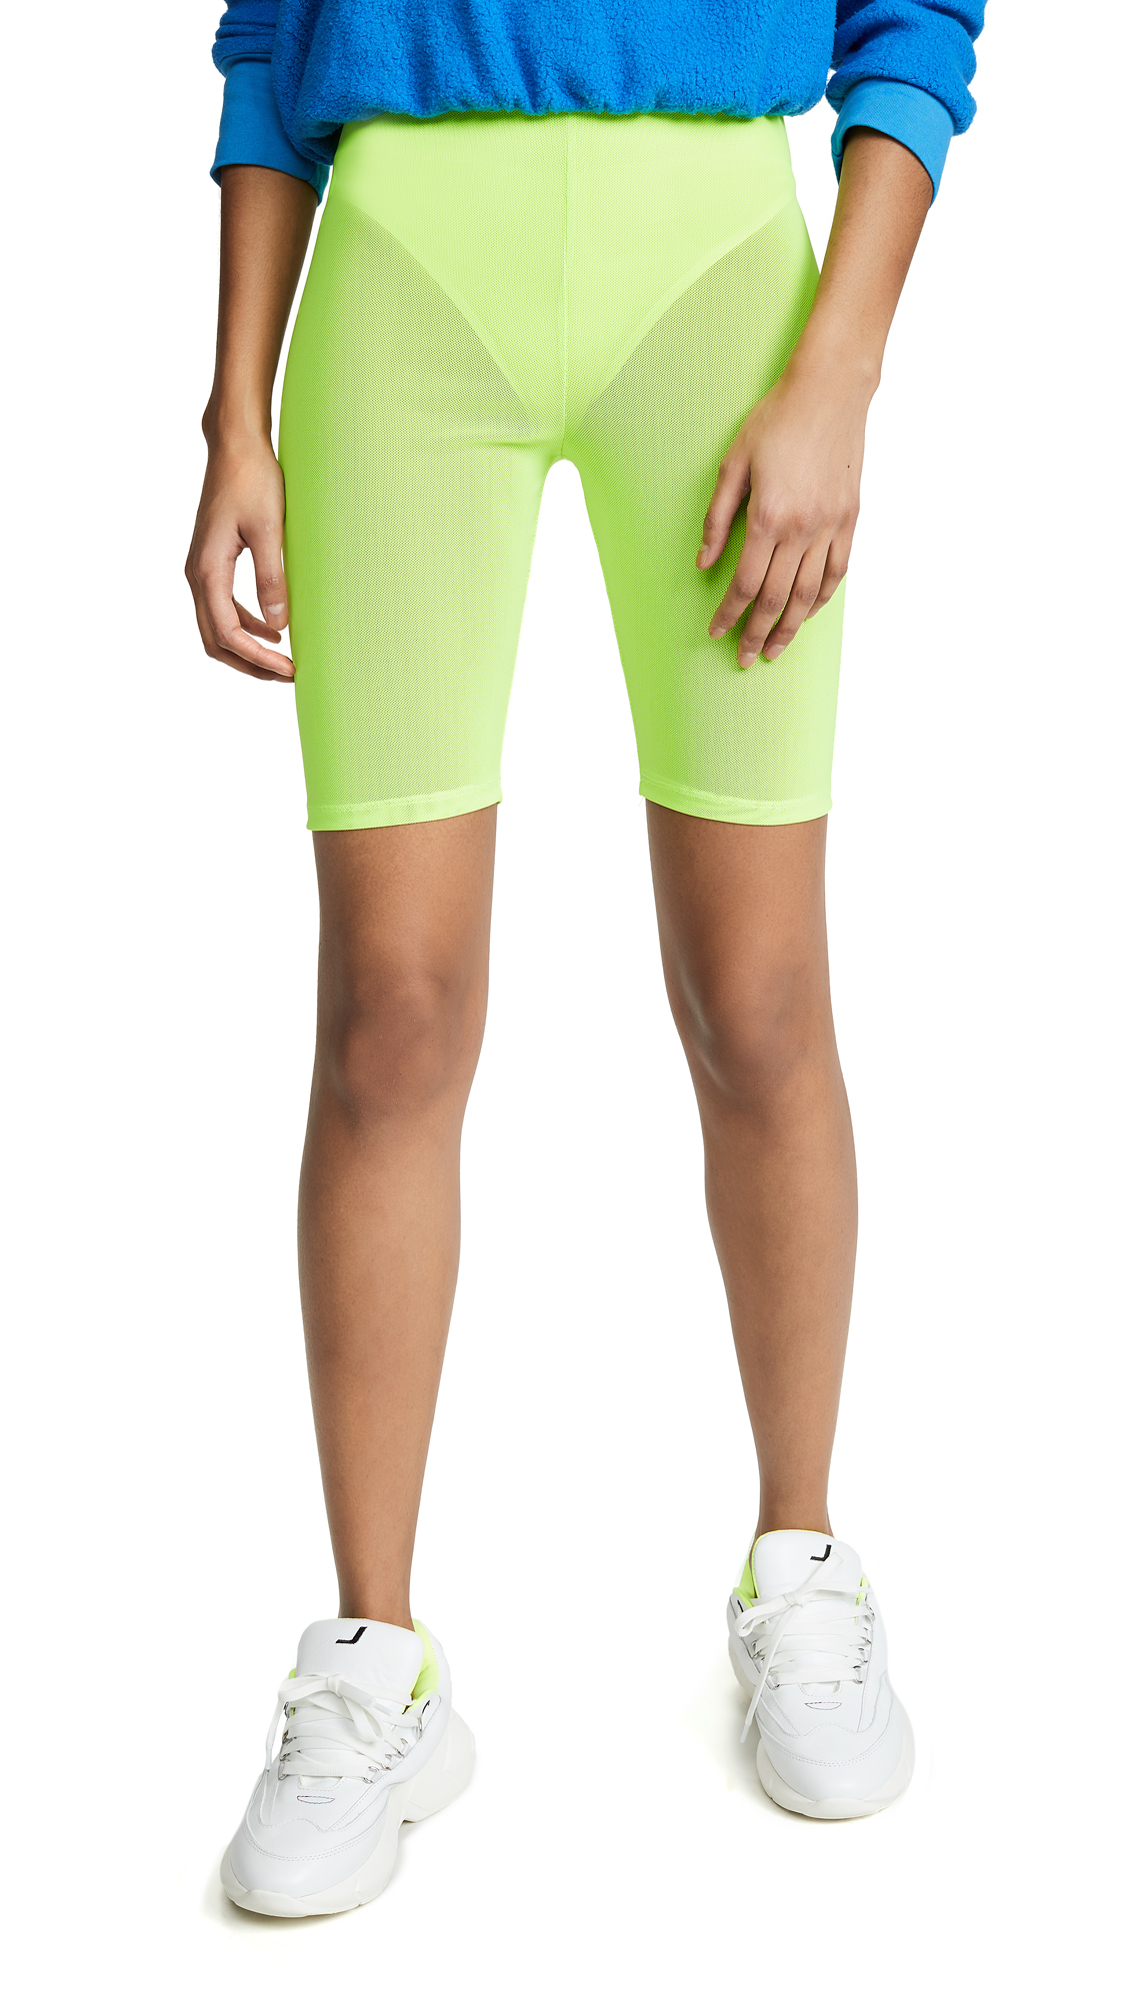 re:named re: named Neon Biker Shorts